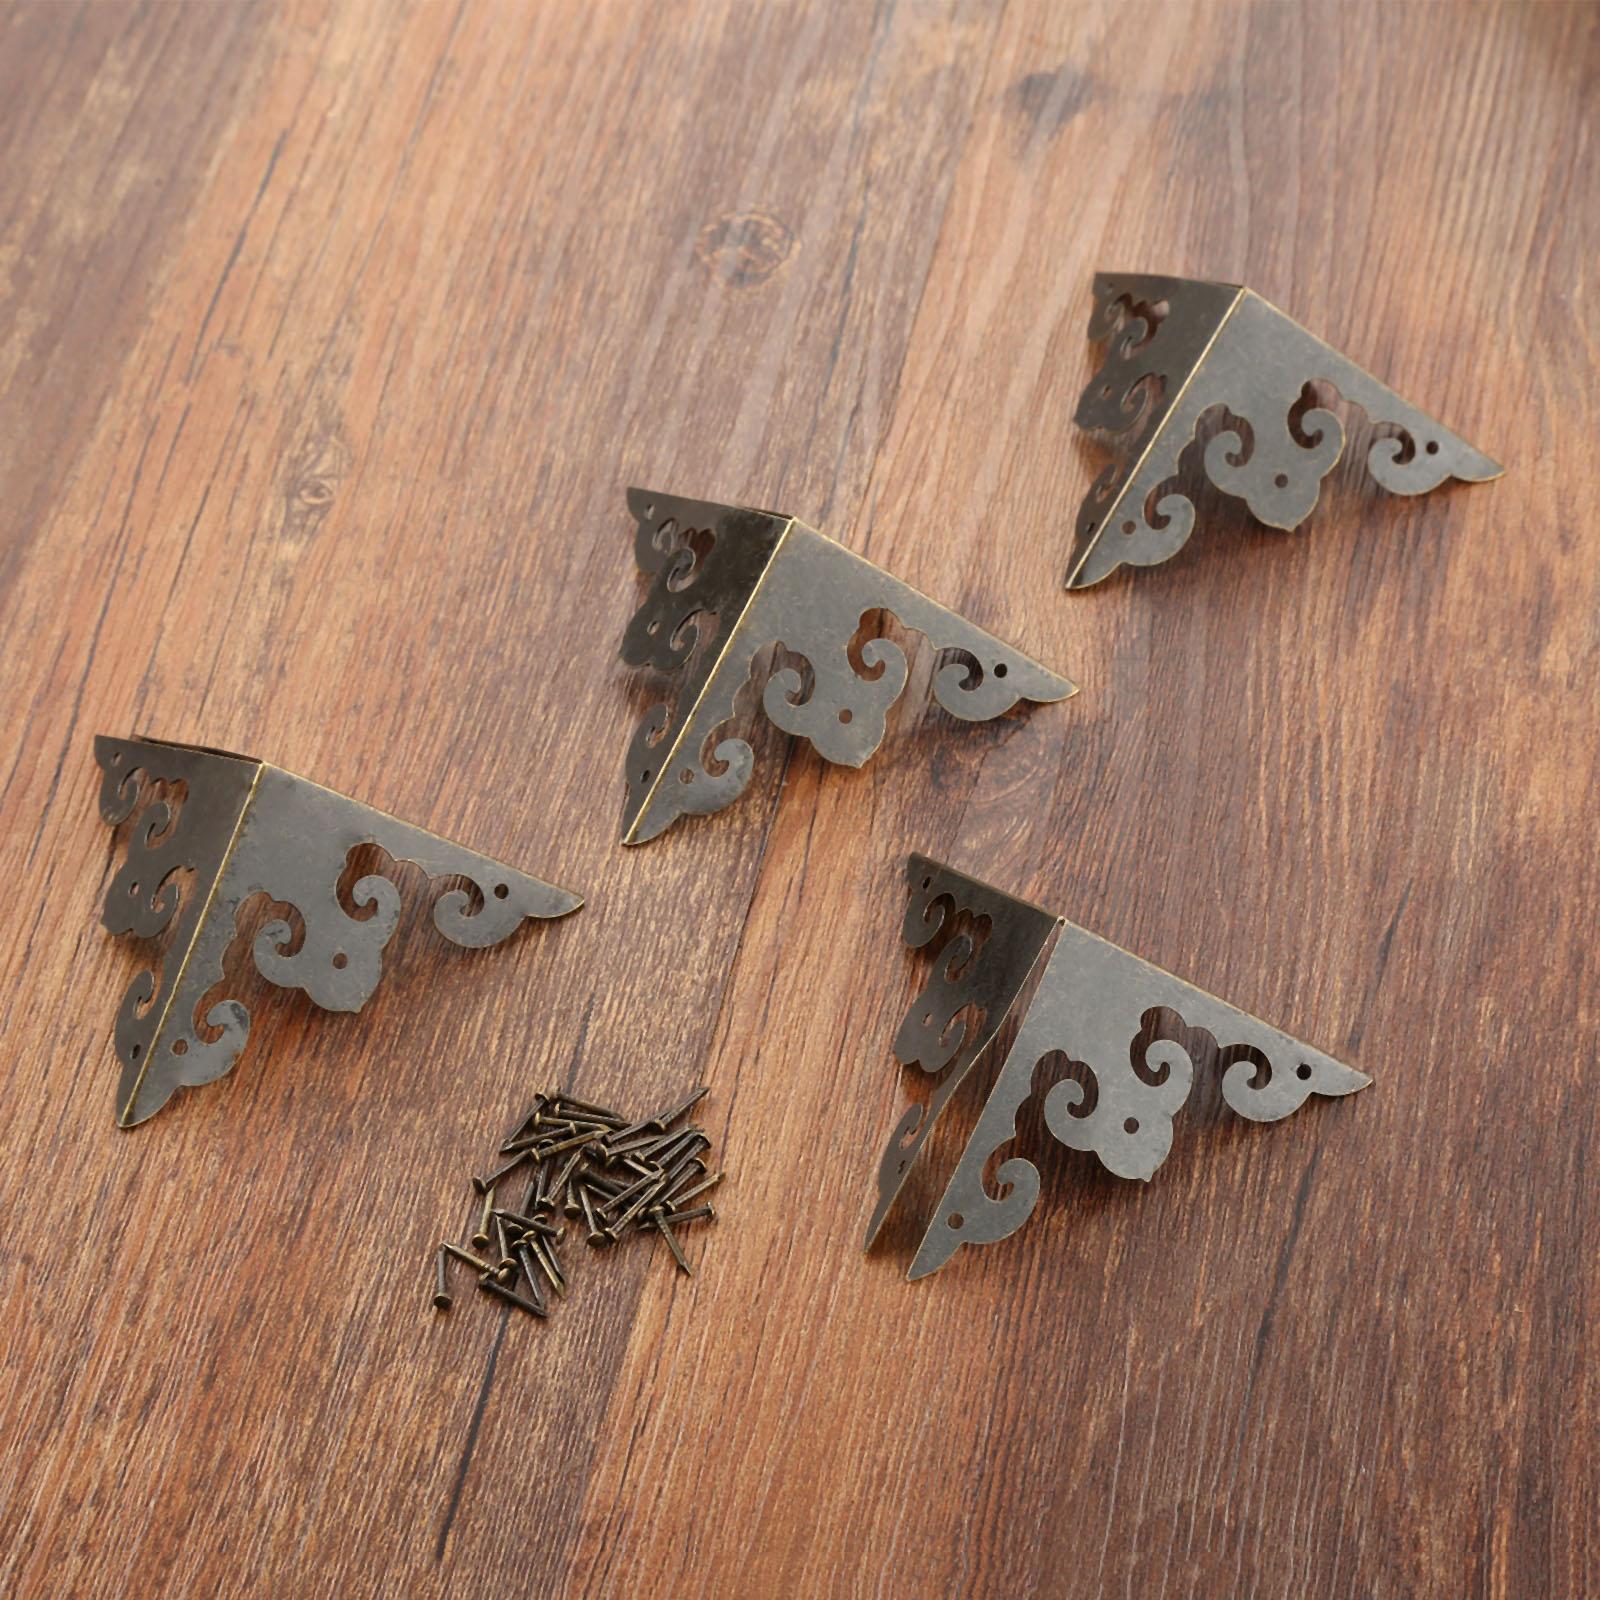 4pcs 50mm Jewelry Chest Box Wood Case Edge Corner Protector Guards Decorative